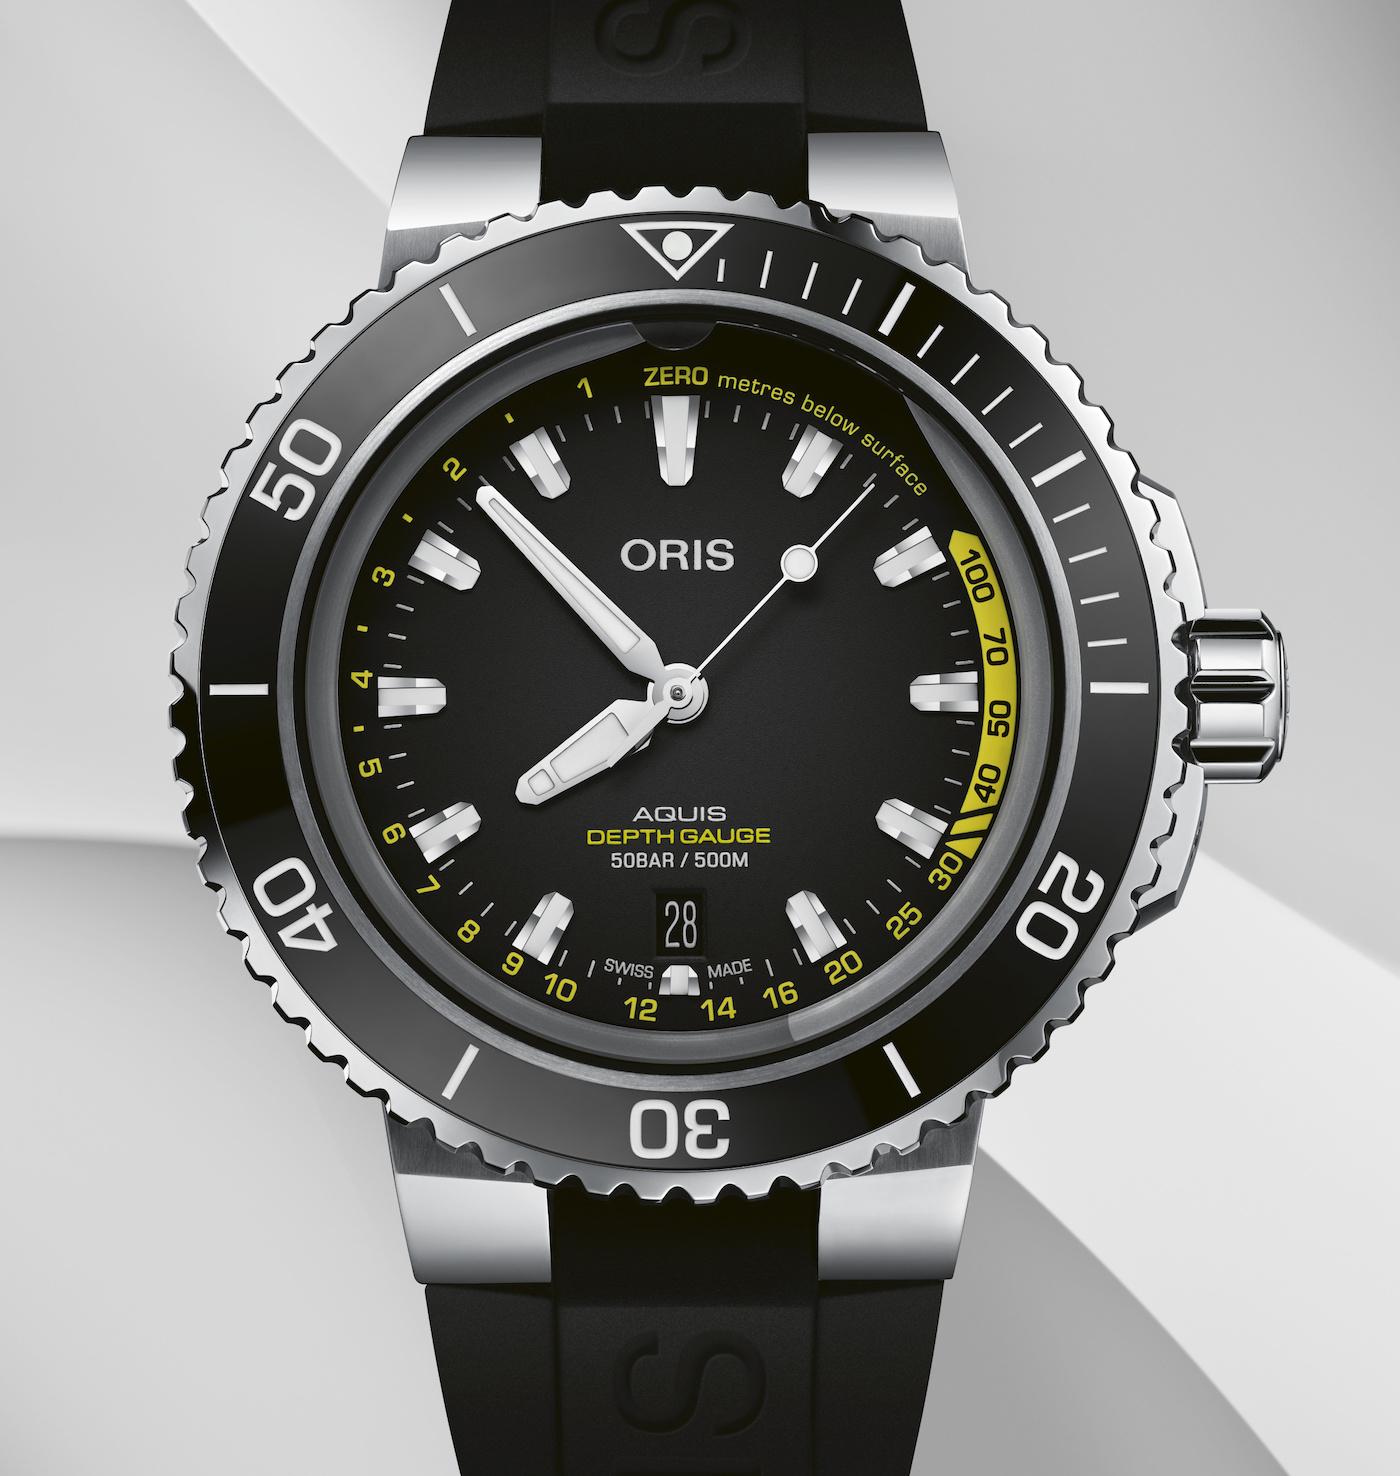 Oris: back into the deep with the Aquis Depth Gauge